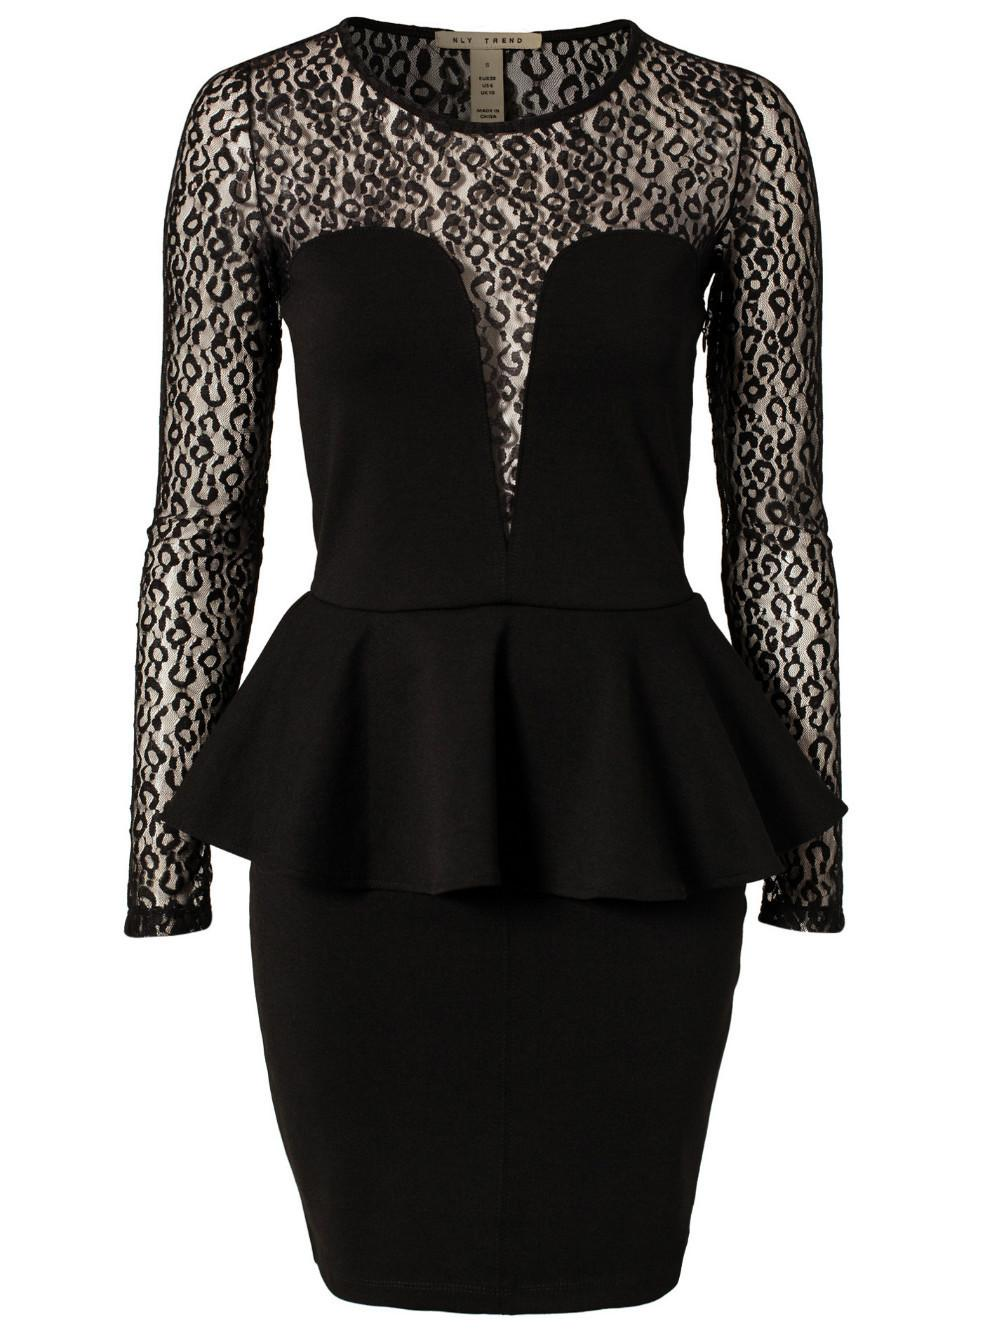 Gratis frakt Hot Women's Clubwear Sexiga Lace Patchwork Cocktail Party Långärmad Peplum Full Dress Lady Casual Dress Svart / Mörk Röd